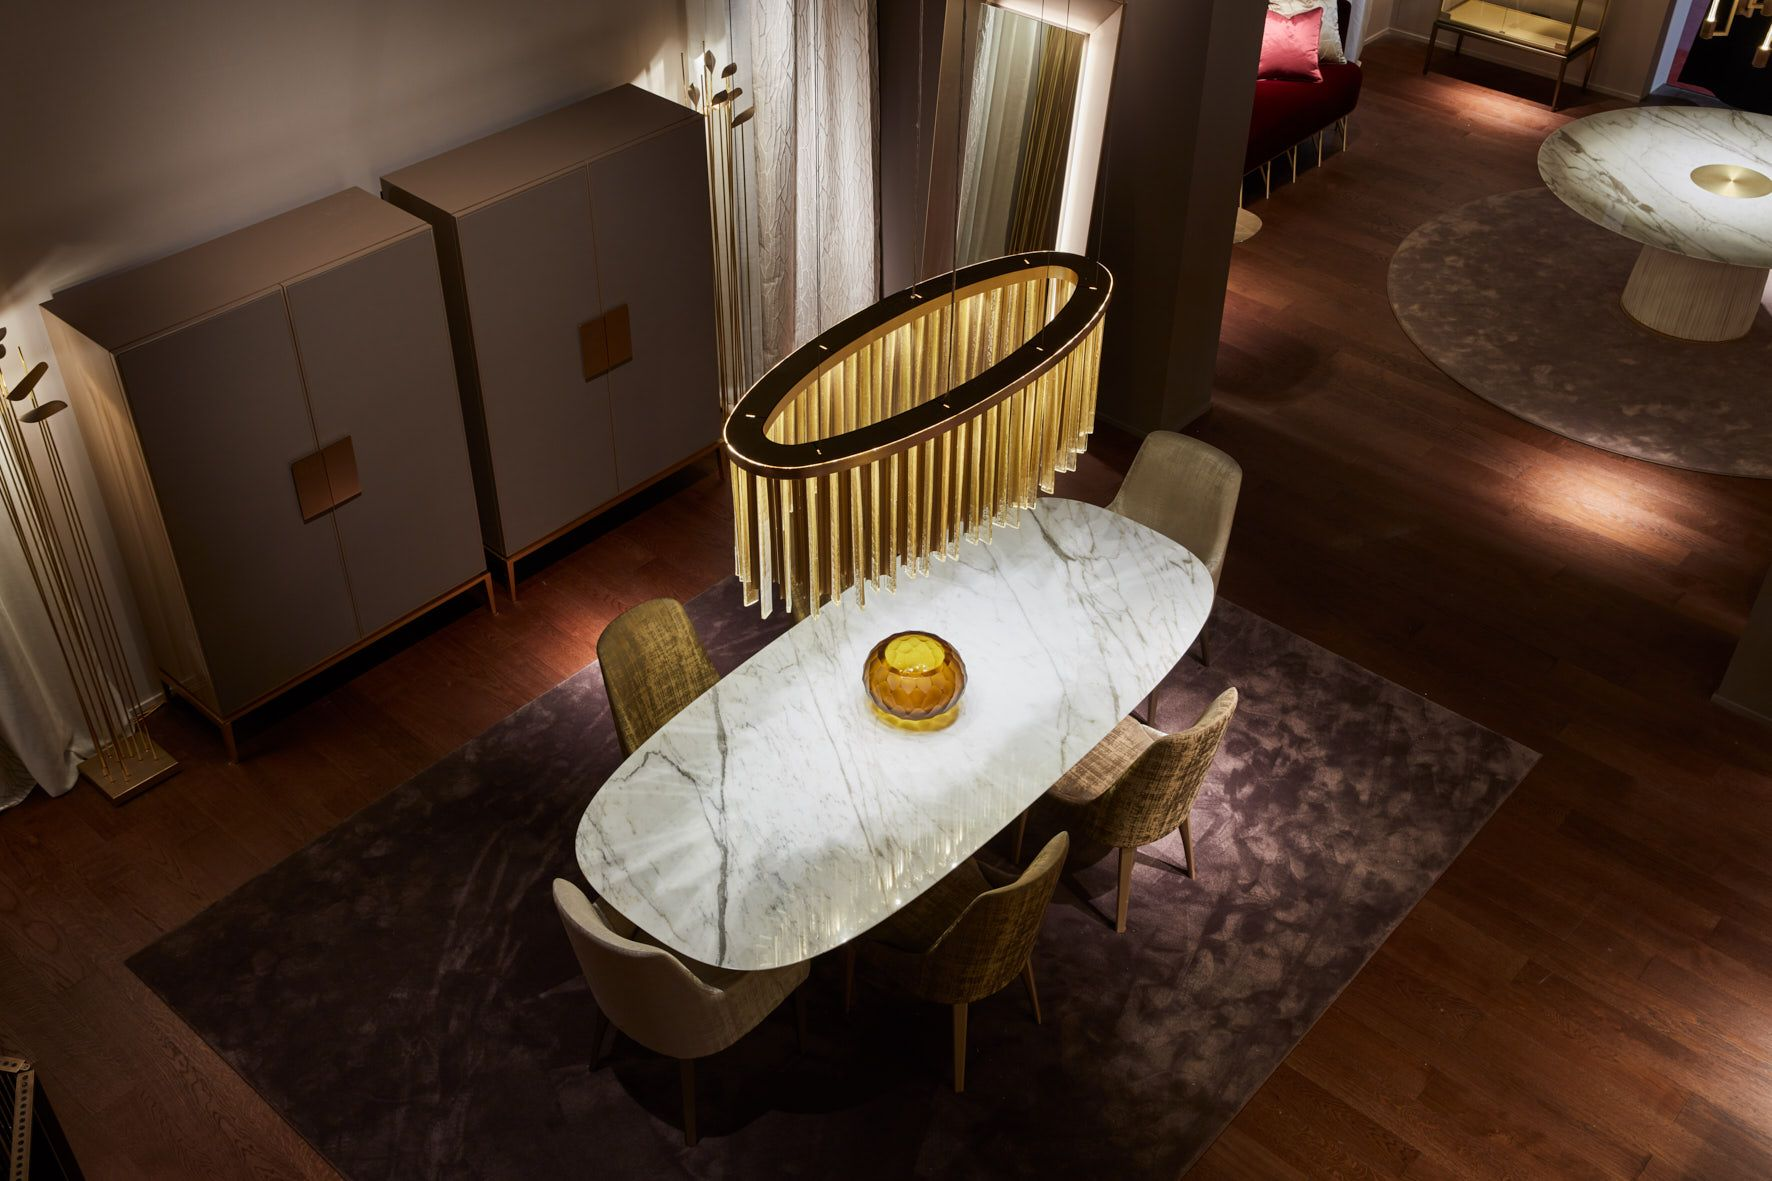 For hall table venus chandelier salone del mobile 2017 pinterest for hall table venus chandelier aloadofball Gallery